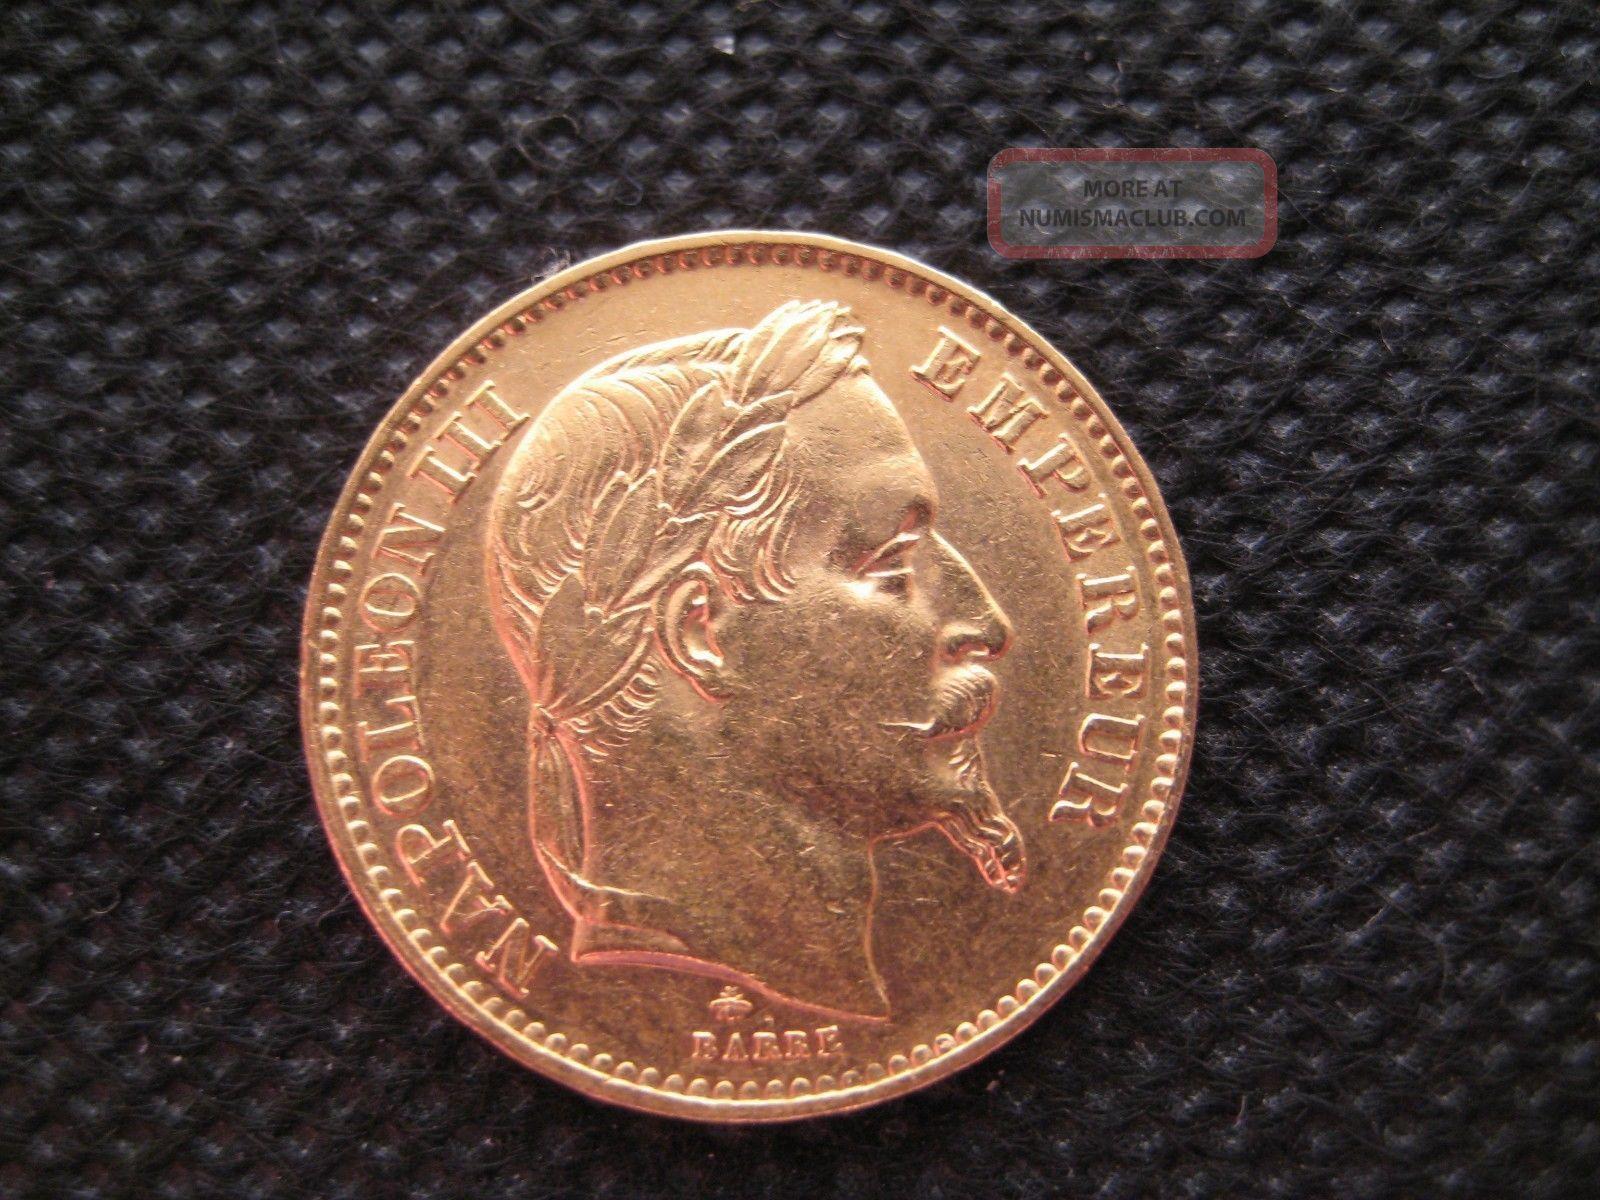 France 20 Francs Napoleon Iii 1867 Oz Gold Coin